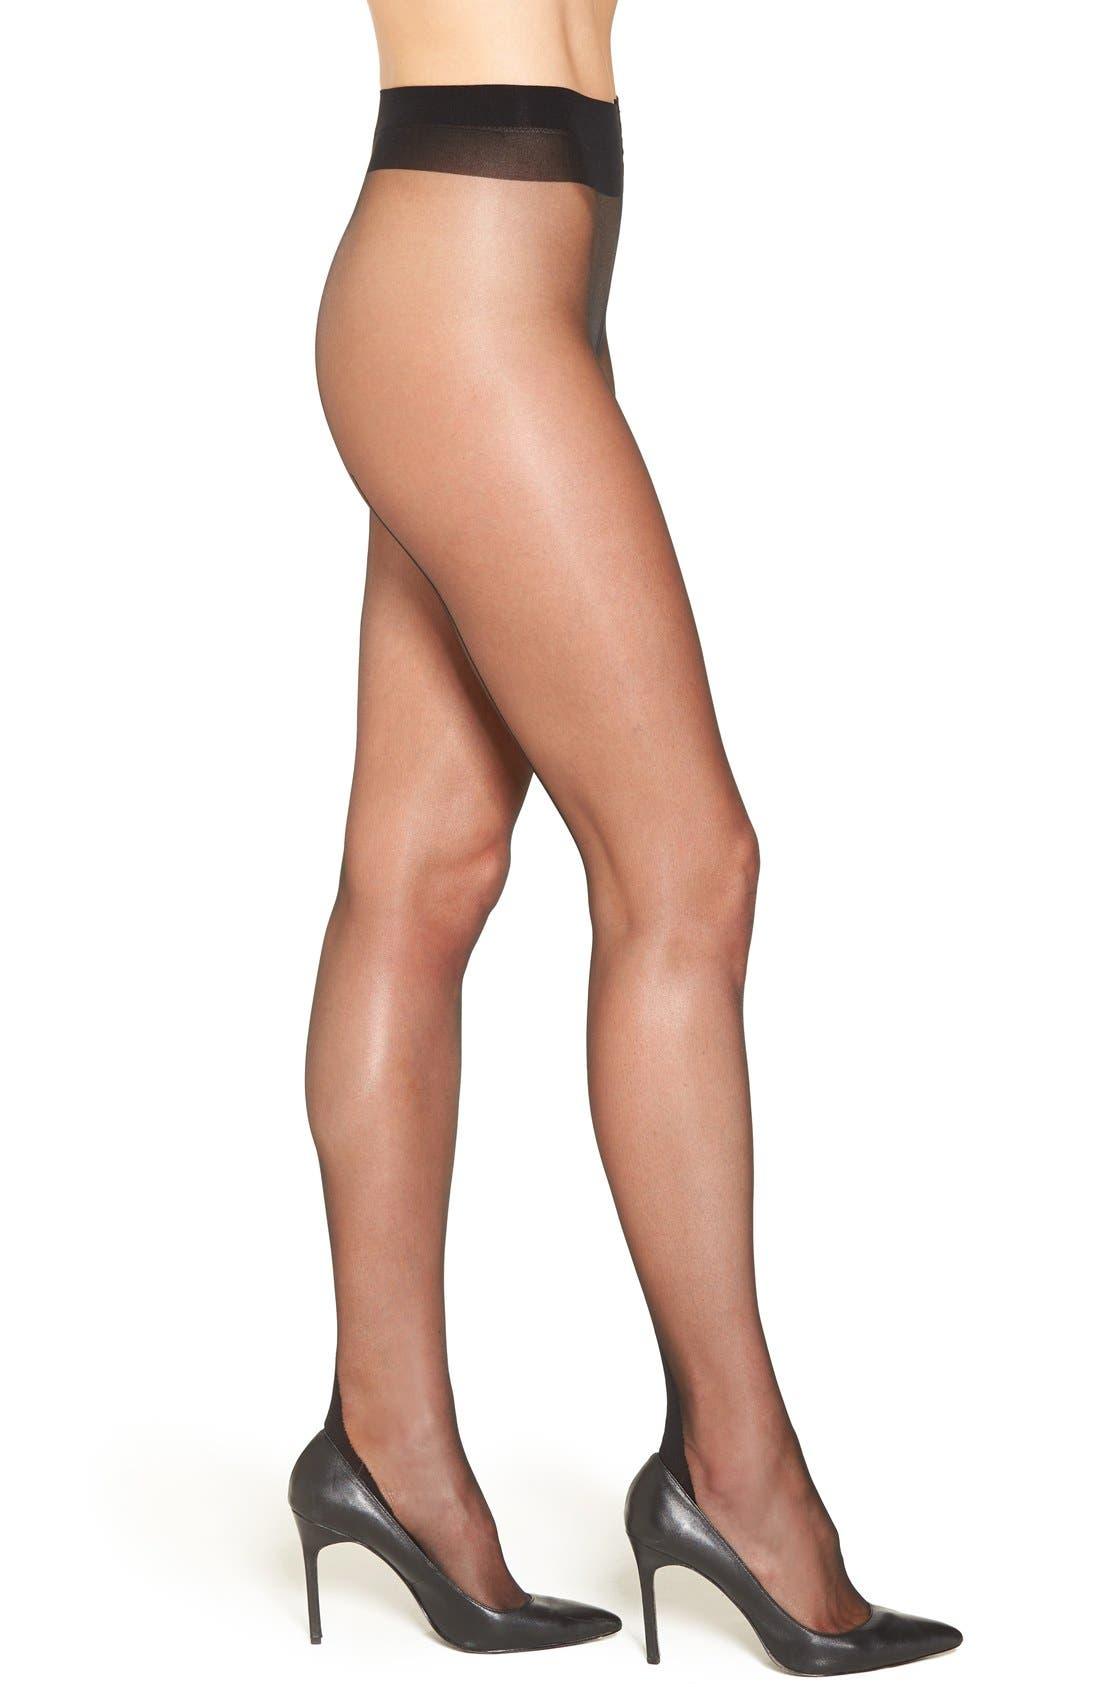 Main Image - Falke 'High Heel' Back Seam Pantyhose